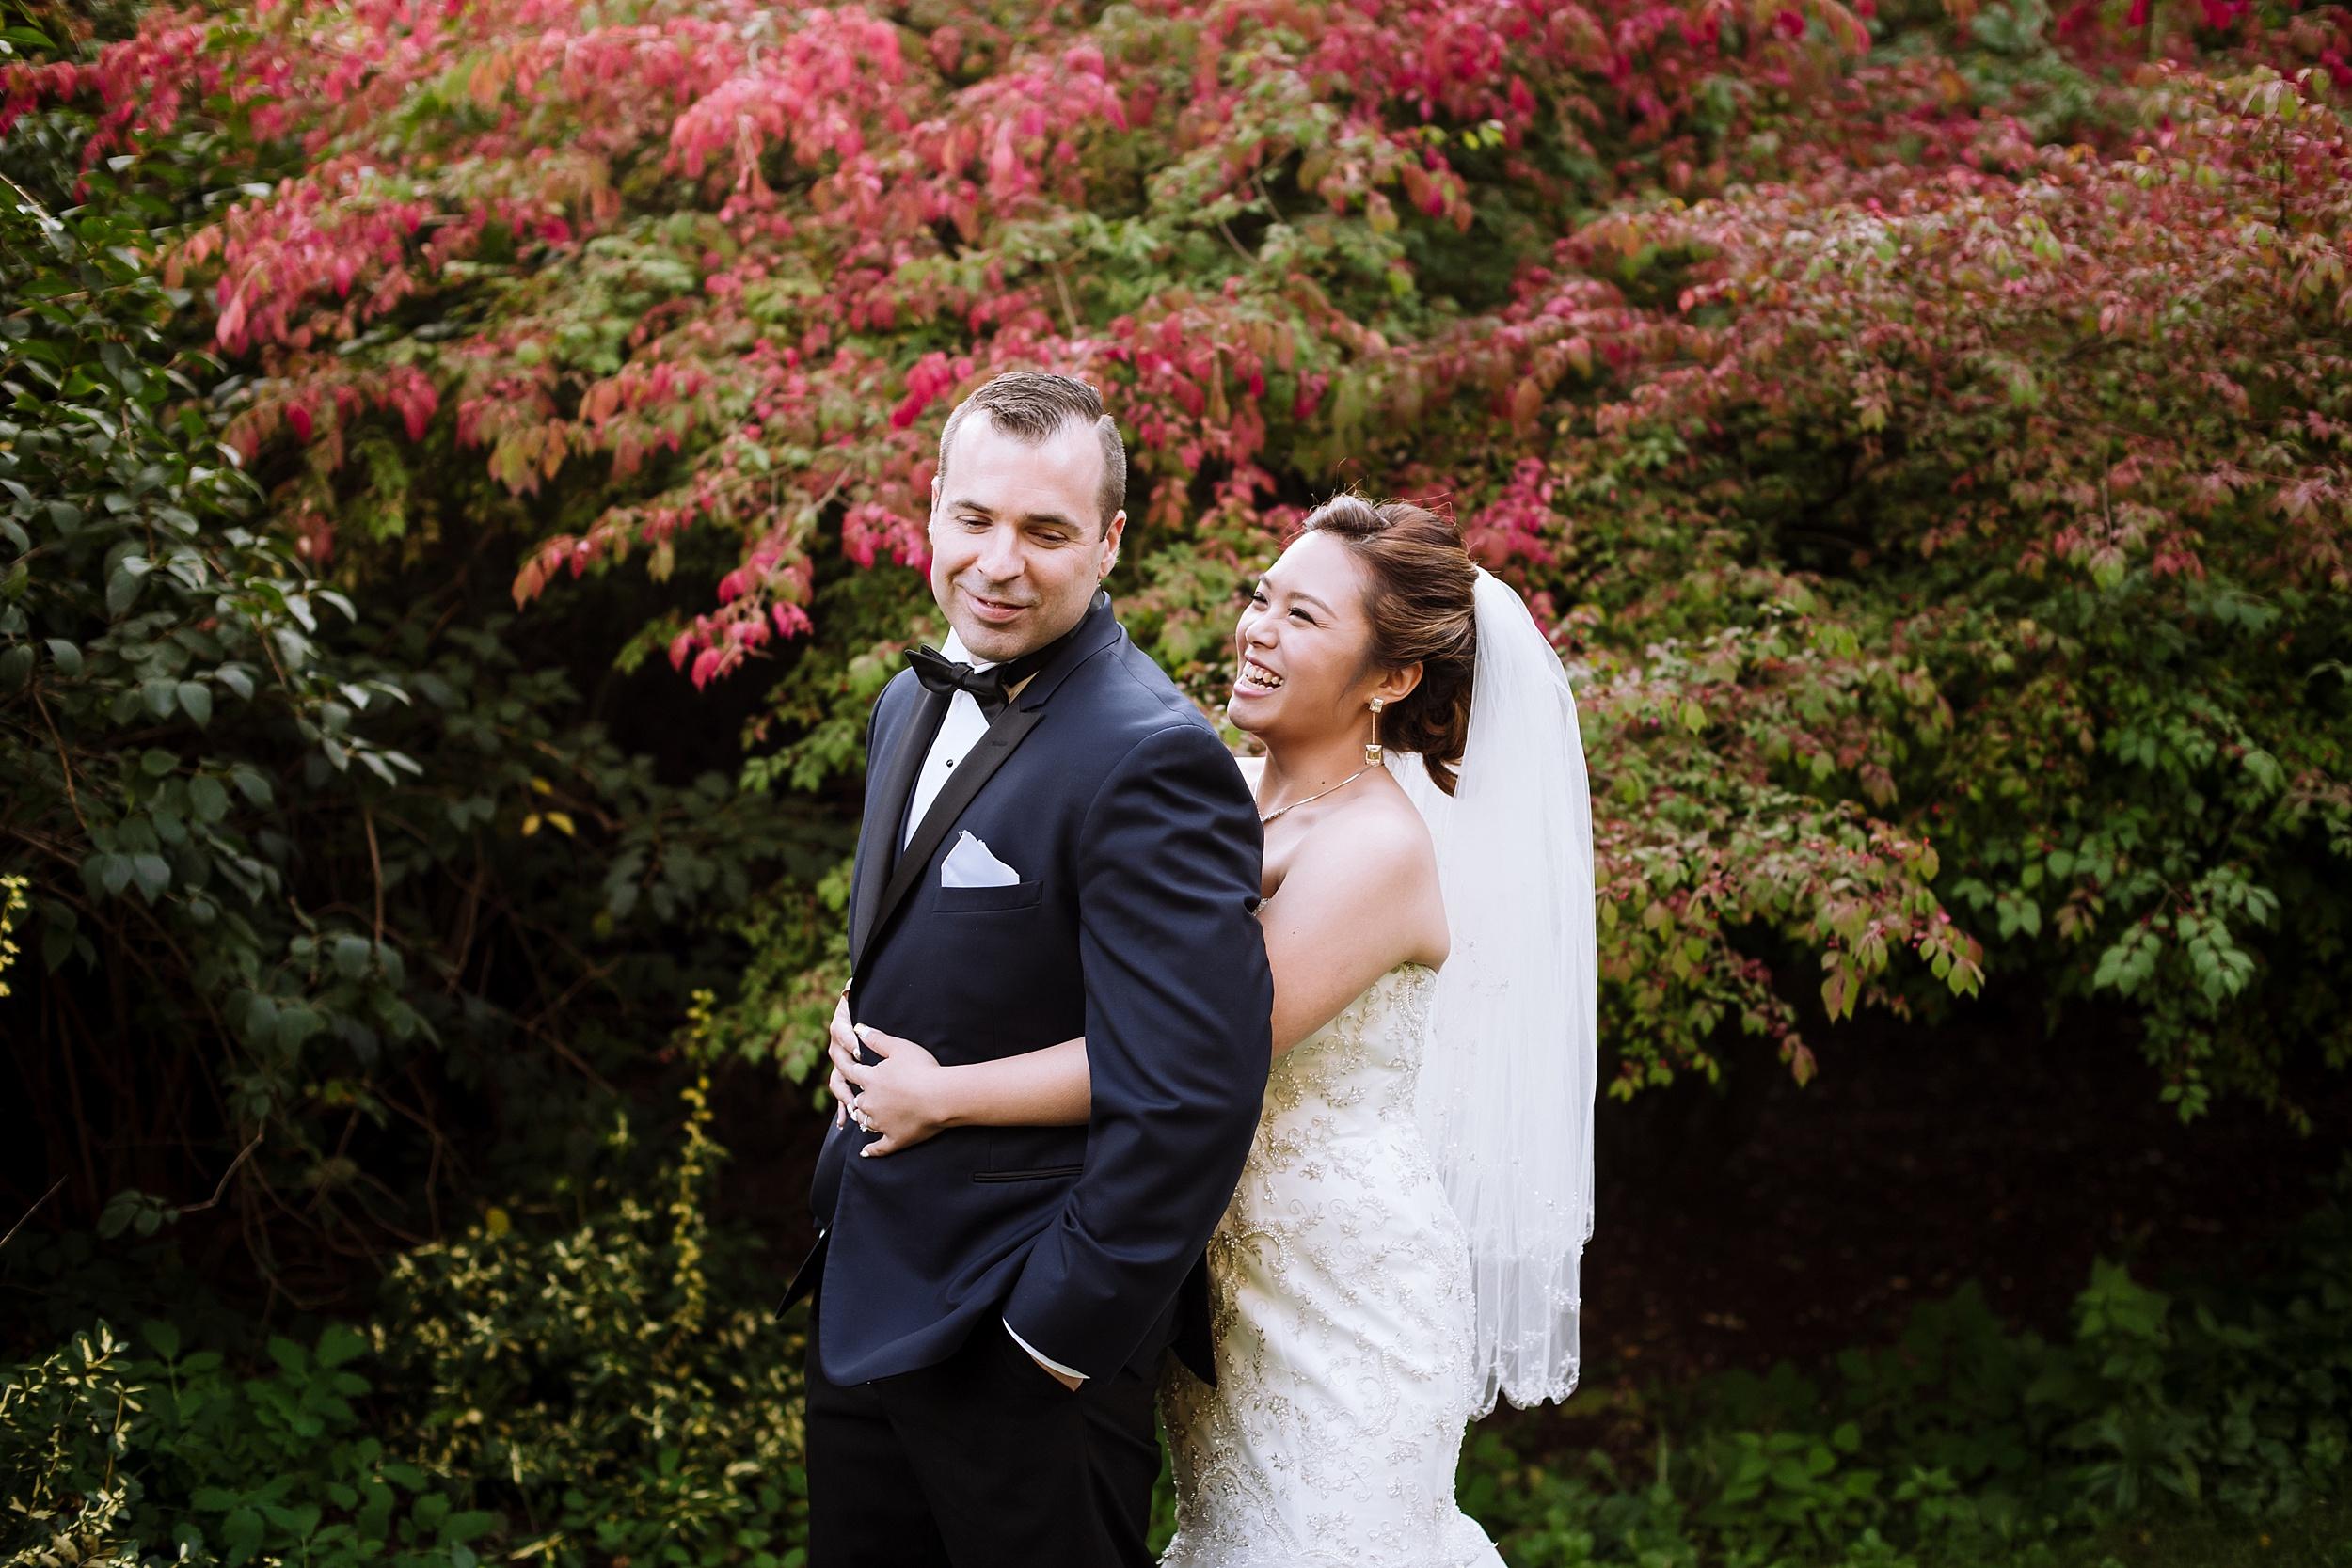 Sunnybrook_Estates_Alexander_Muir_Toronto_Wedding_Photographer_0019.jpg